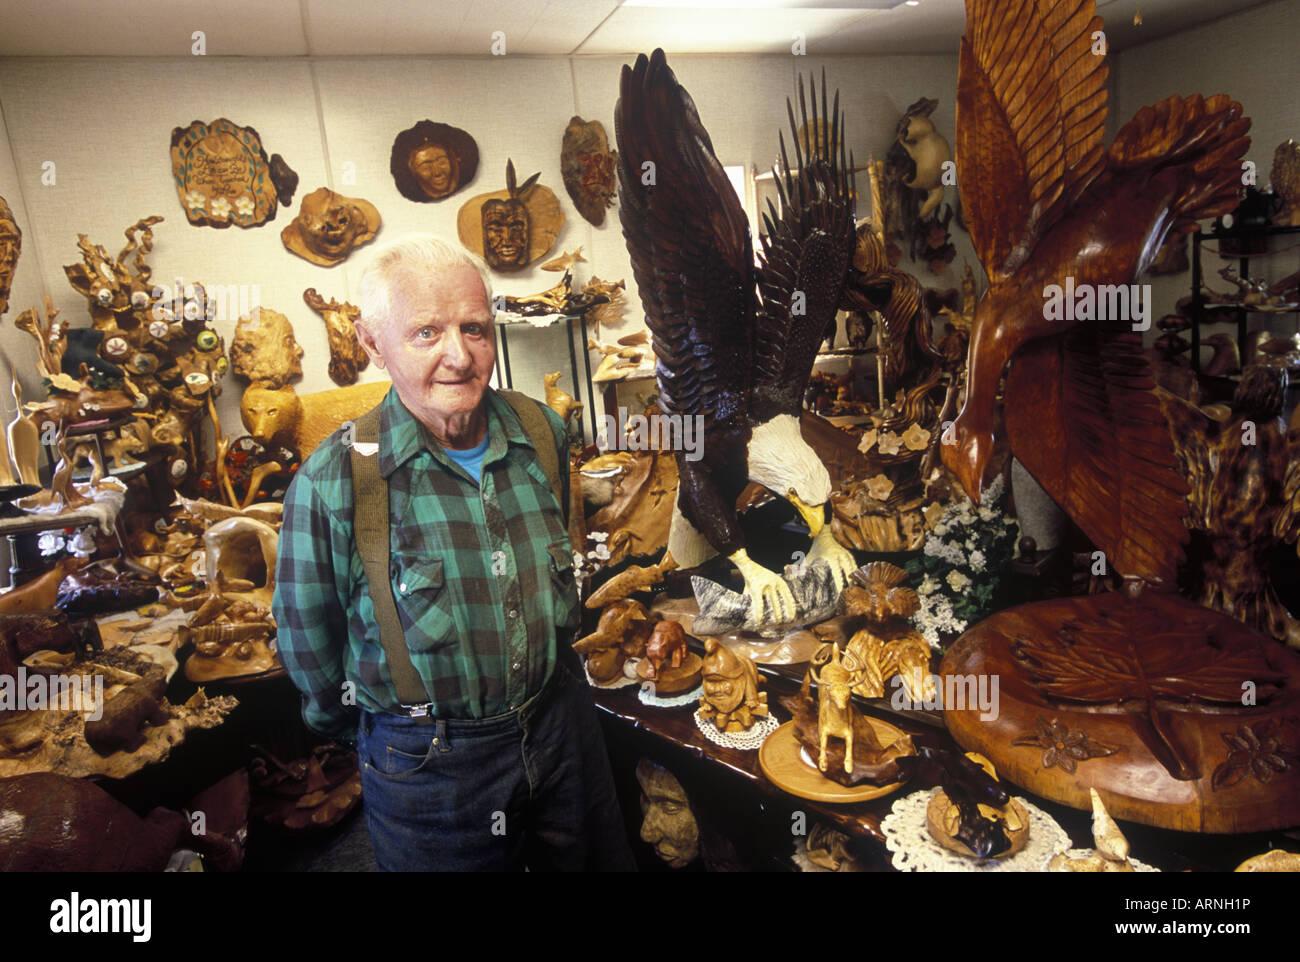 Qualicum Beach Local artisan, woodcarver Paul Bourbeau in his studio, Vancouver Island, British Columbia, Canada. Stock Photo